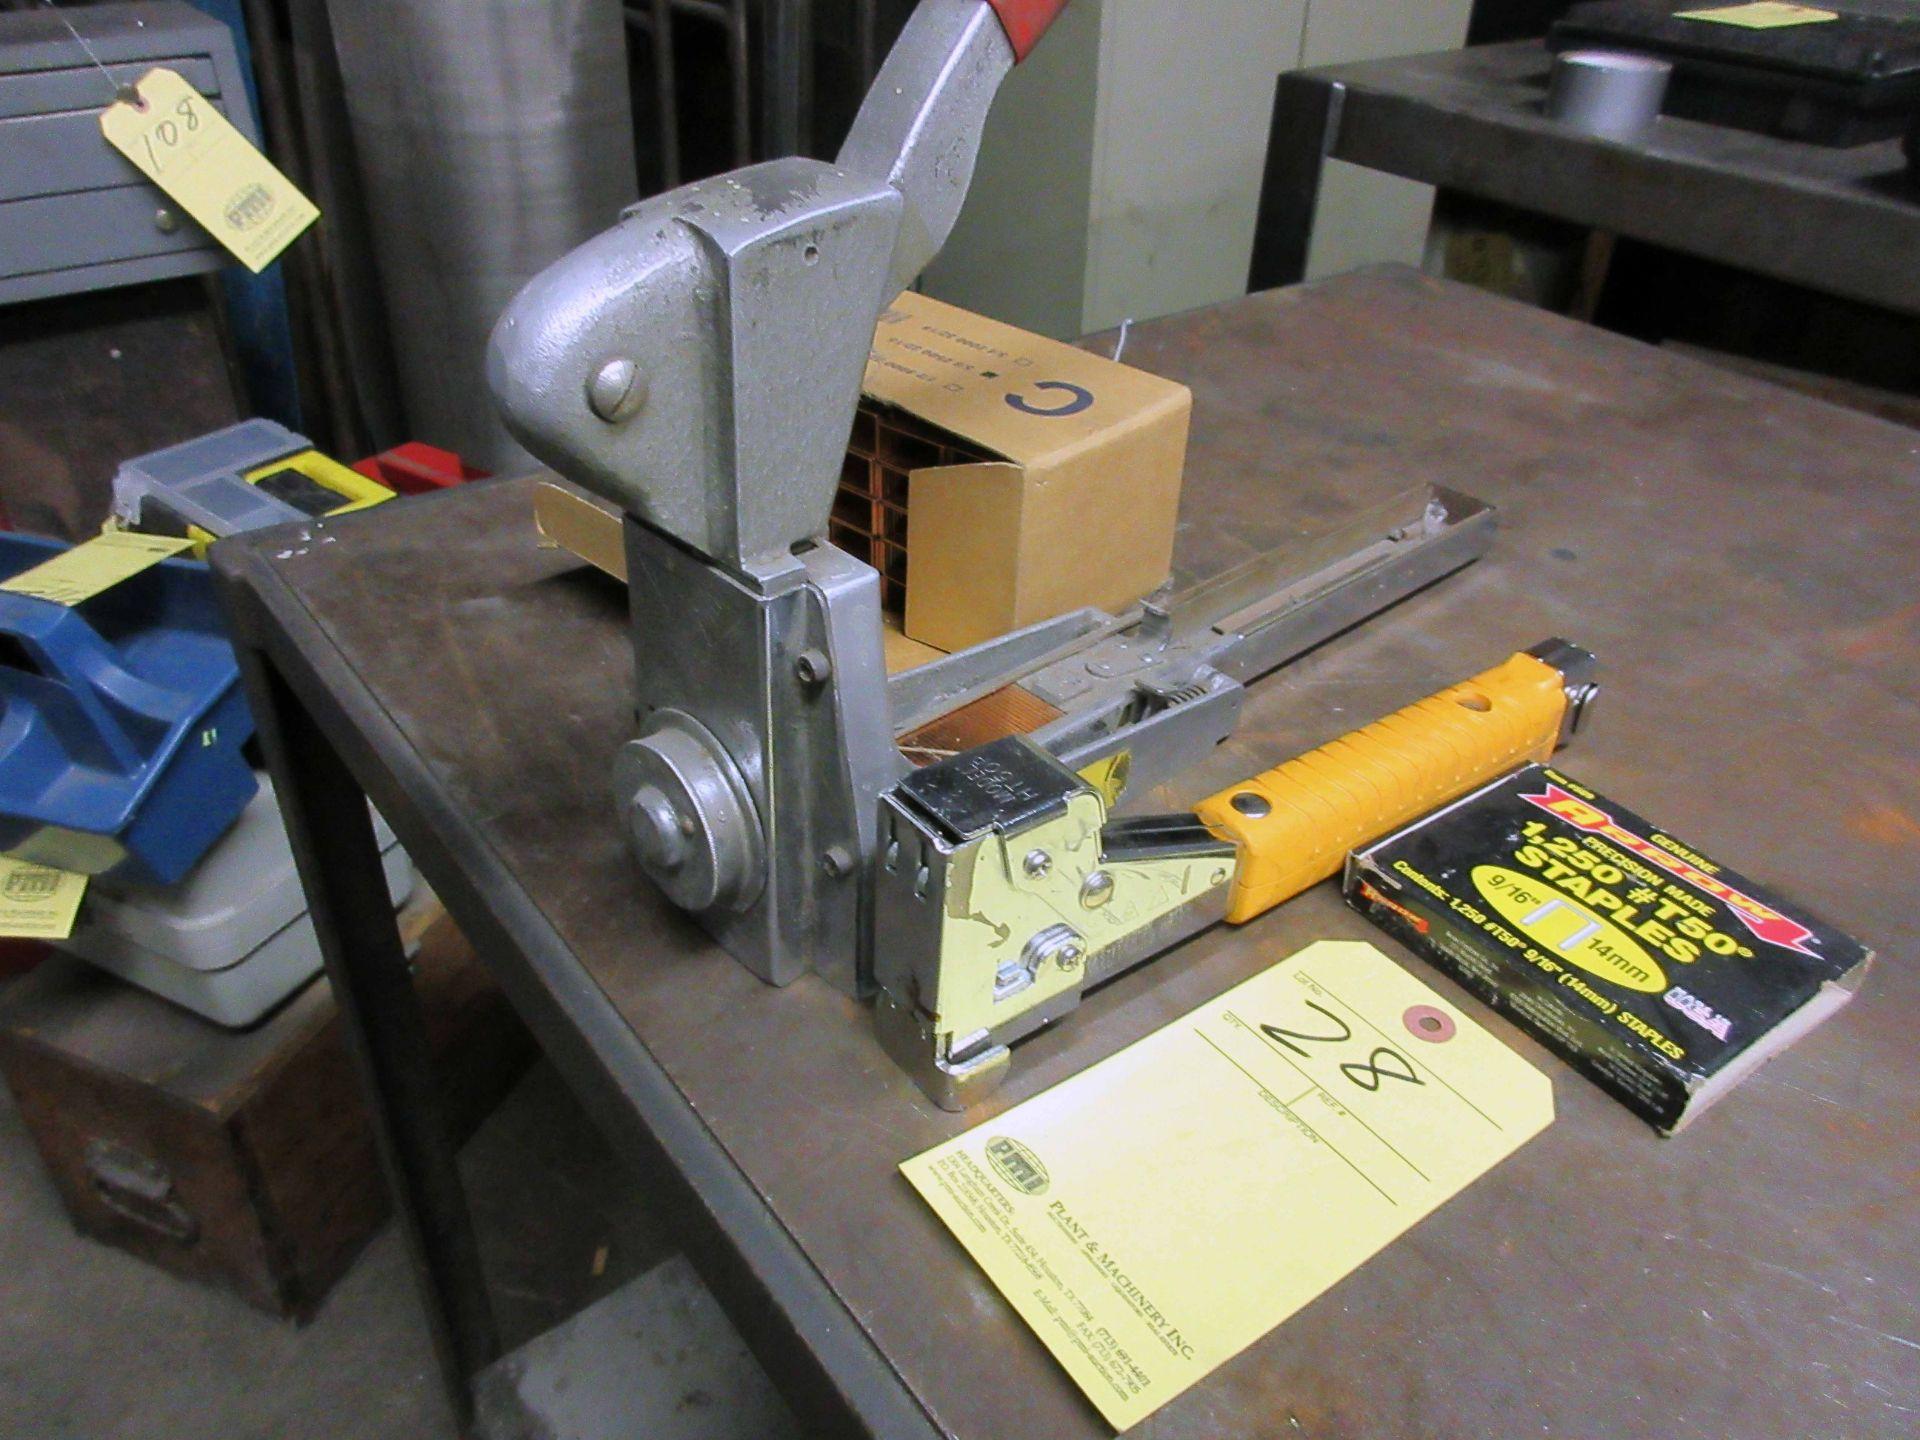 "Lot 28 - LOT CONSISTING OF: San Jacinto 5/8"" stapler w/box of staples & 9/16"" slap stapler"